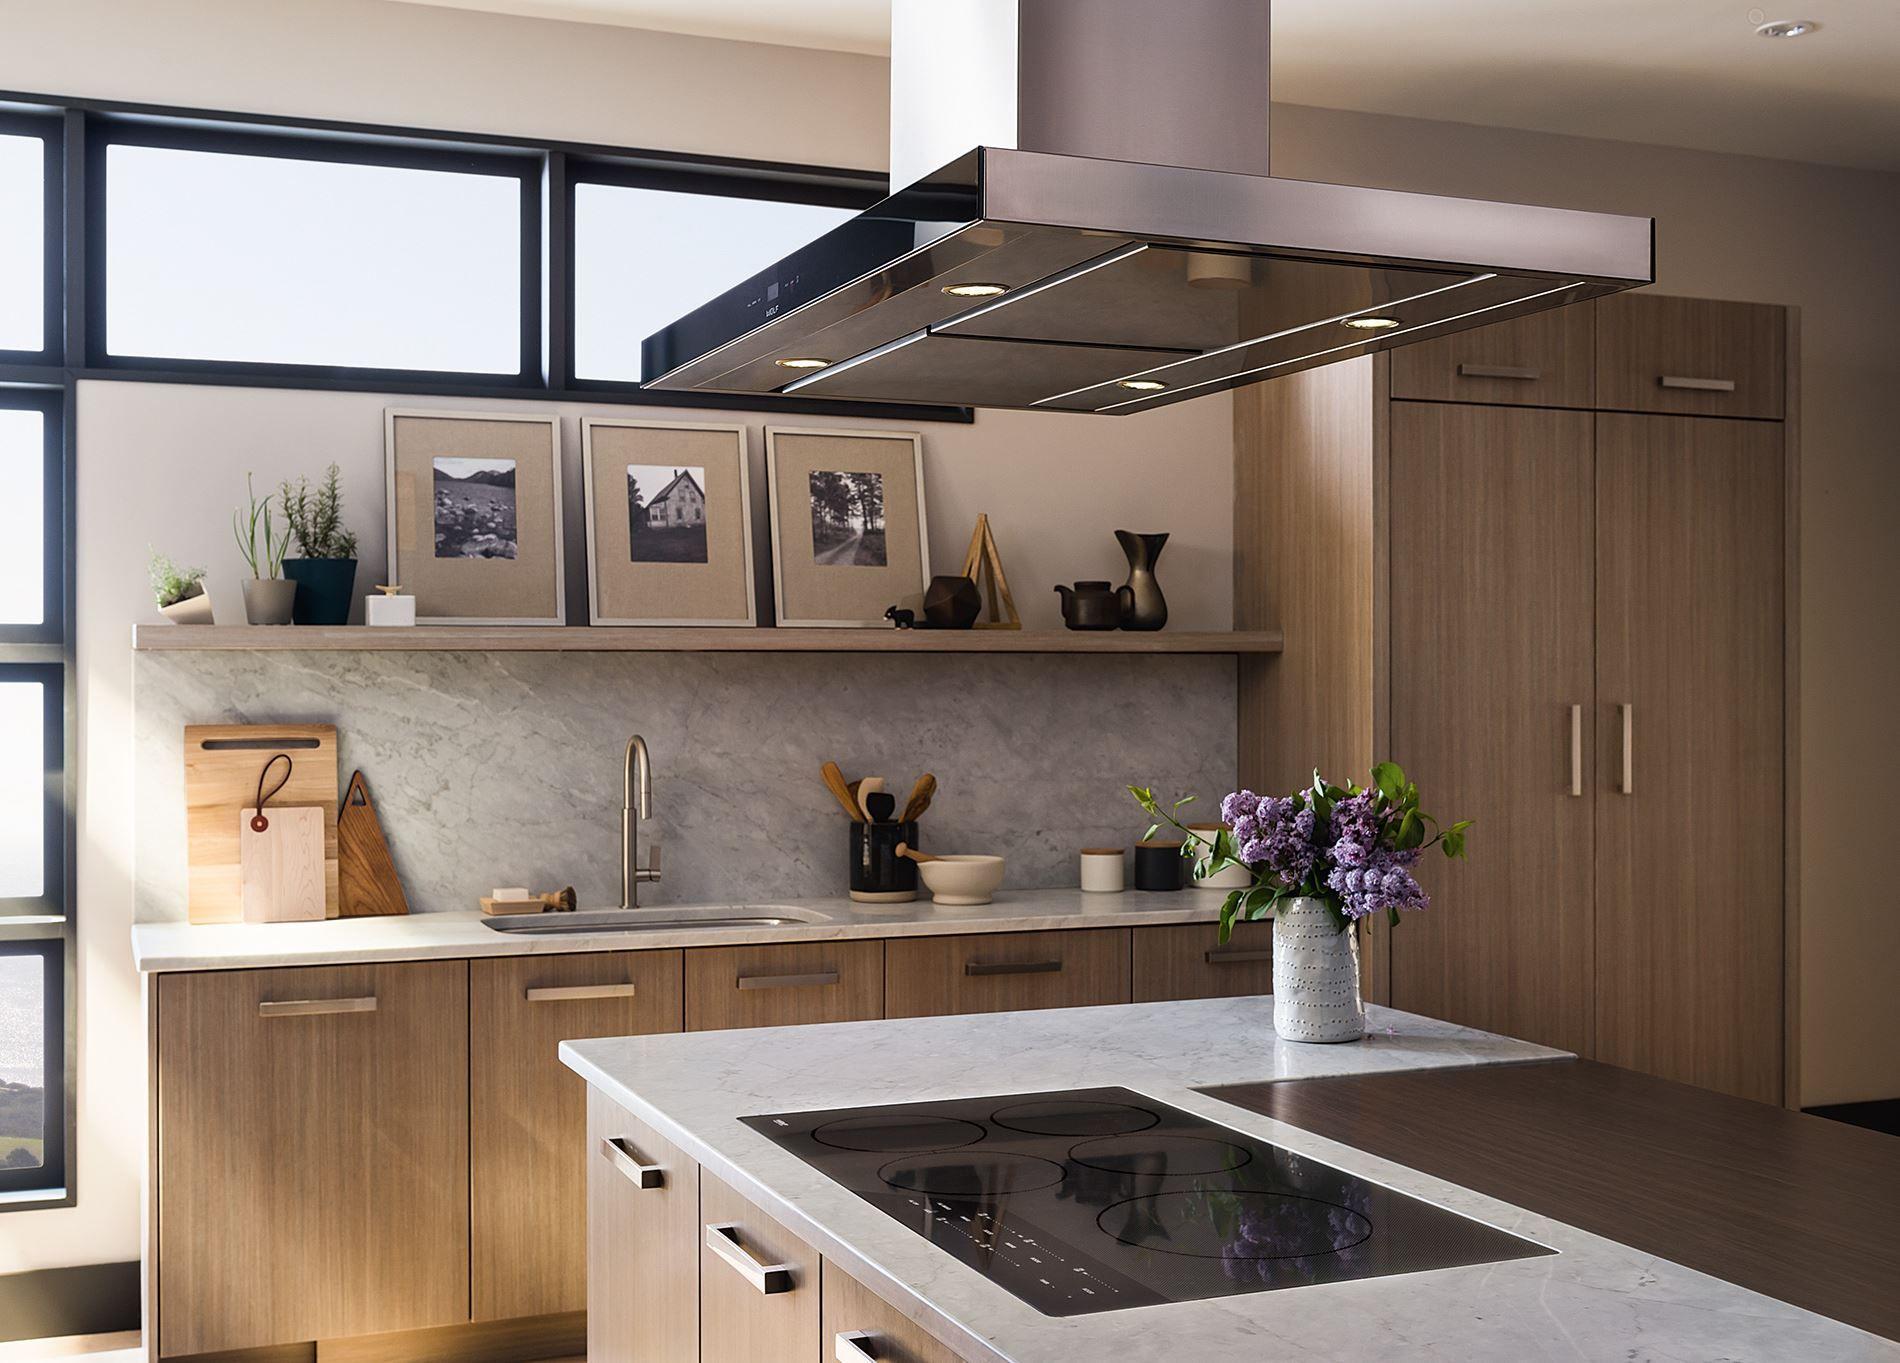 Wolf Low Profile Modern Island Hood Review Cteih42i Kitchen Island With Cooktop Kitchen Ventilation Kitchen Hood Design